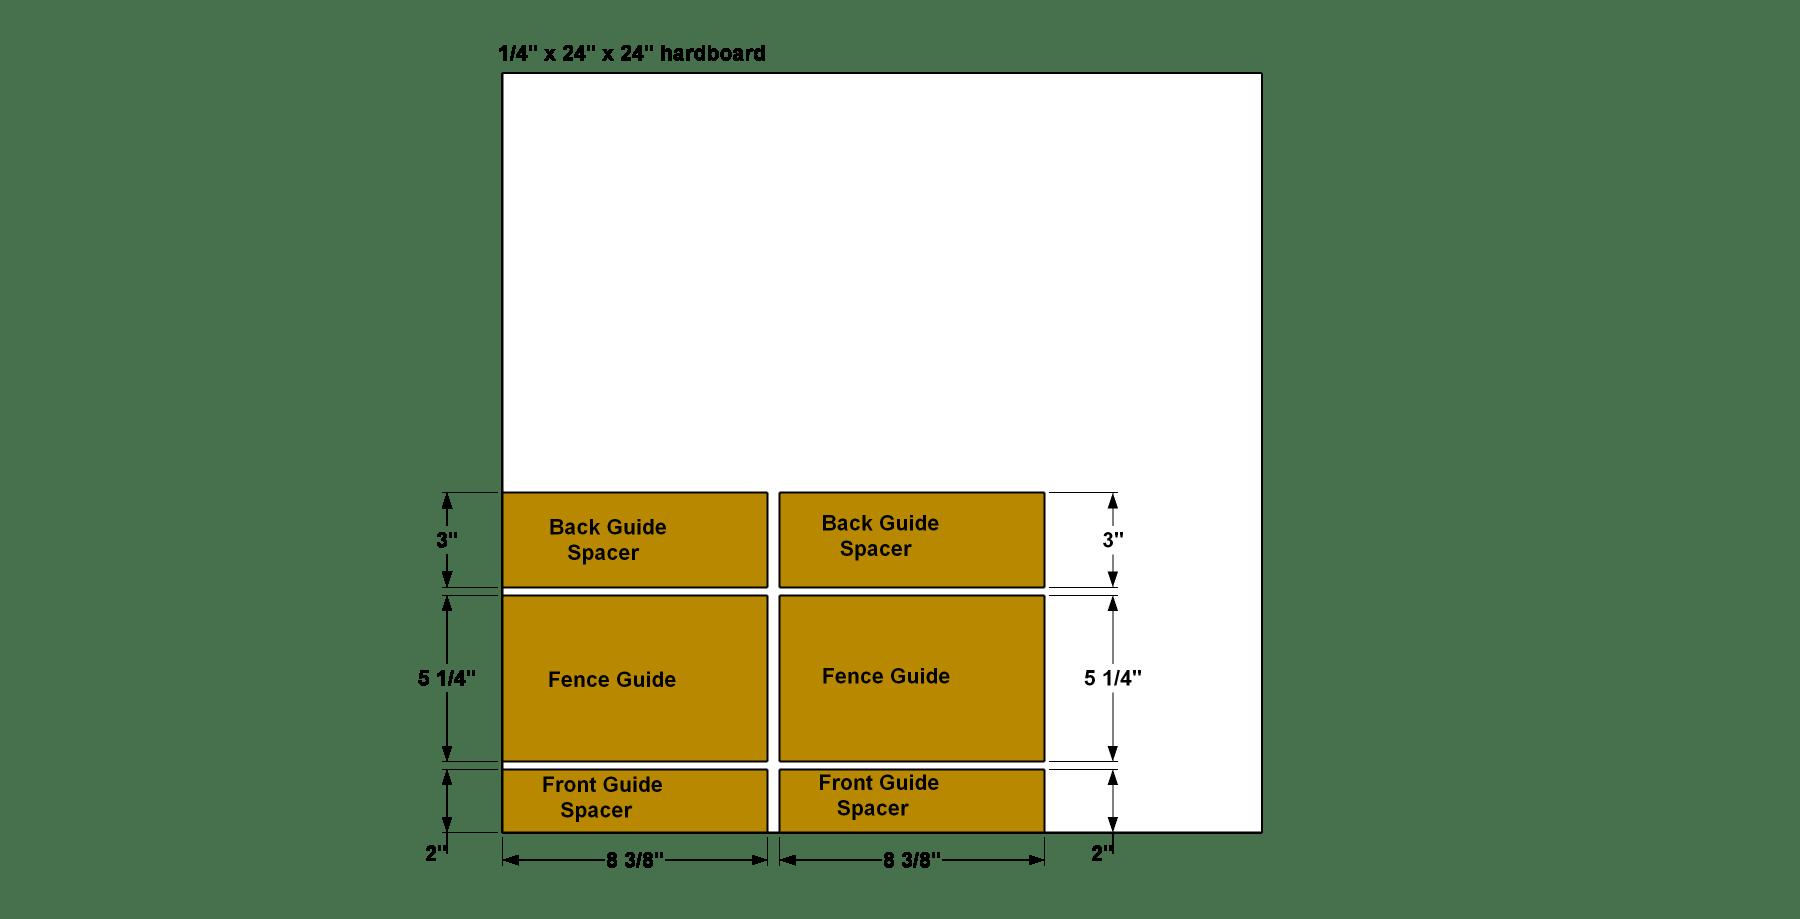 kreg-jig-work-center-cut-diagram-hardboard